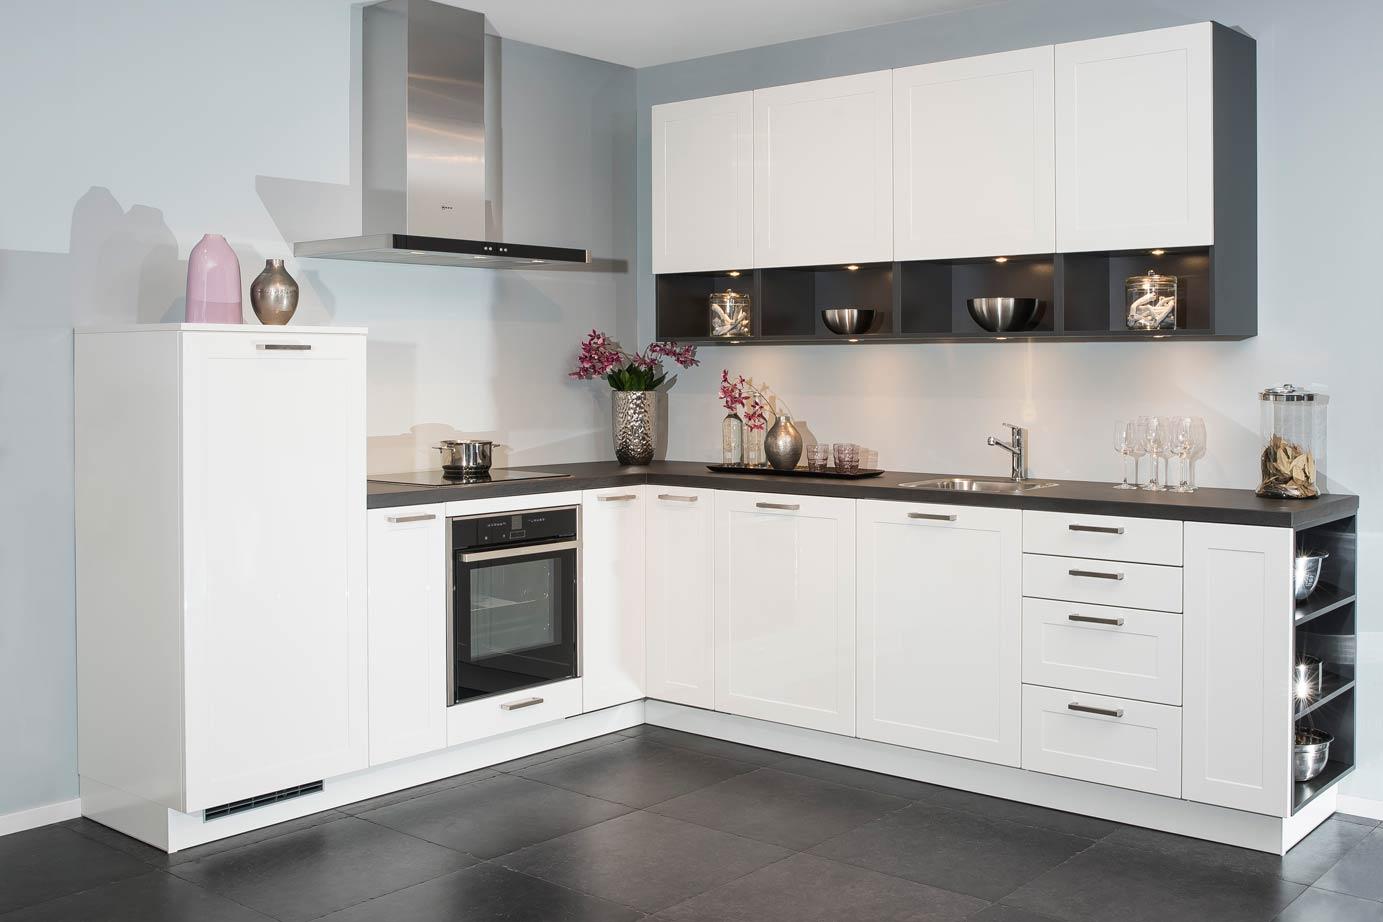 Keur Keukens Keukentegels : Tijdloze keukens jaren variëren met neutrale elementen db keukens